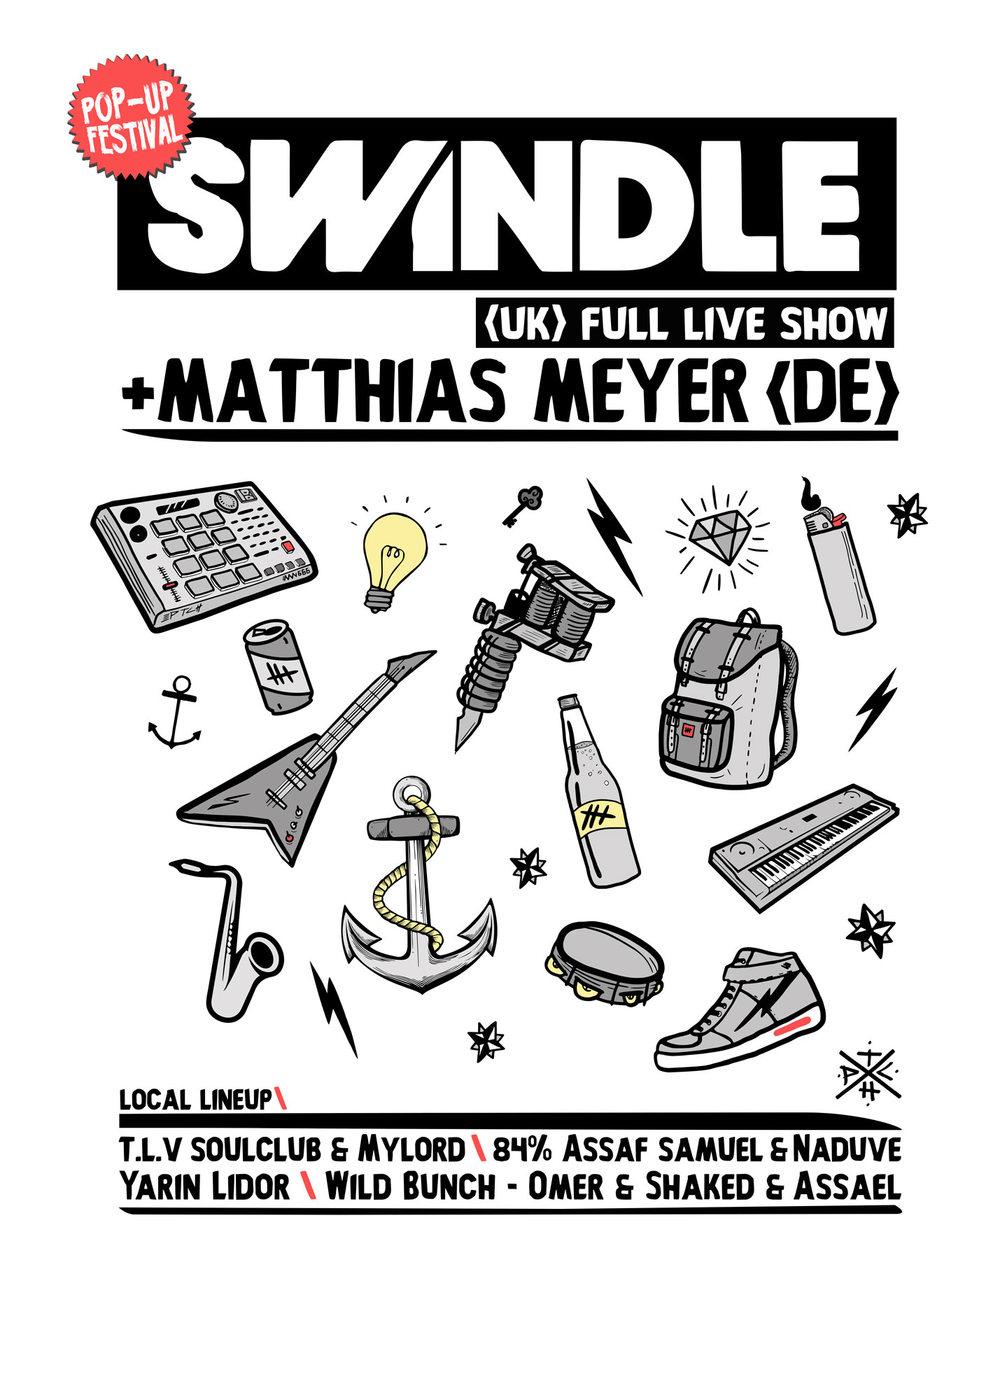 swindle2-small.jpg